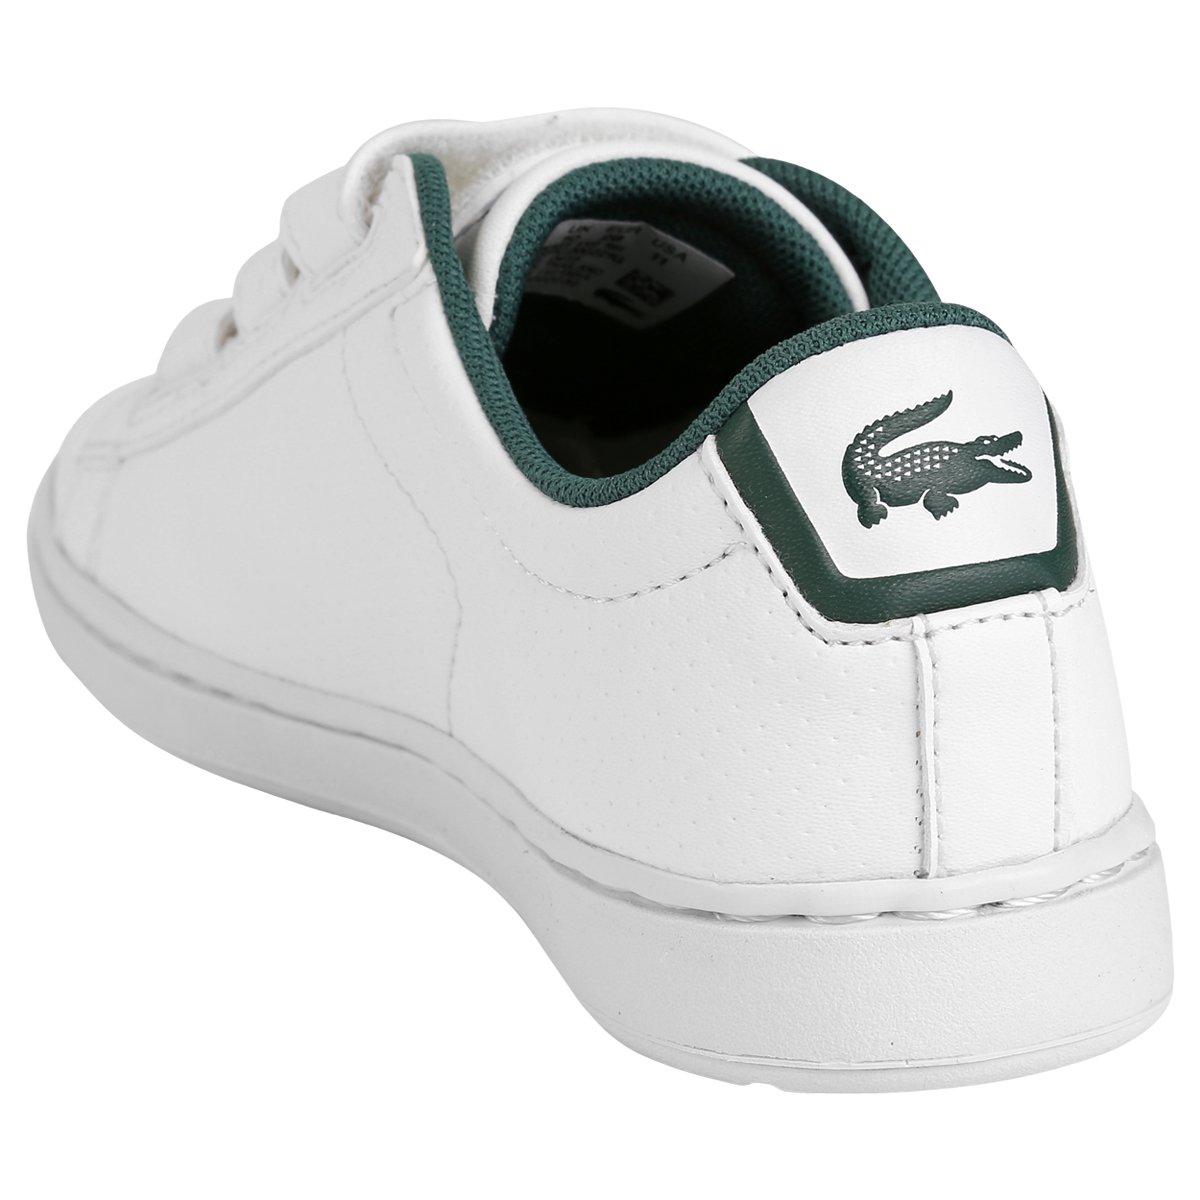 f24282559aaf5 Tênis Lacoste Carnaby Evo Rei Infantil - Compre Agora   Netshoes